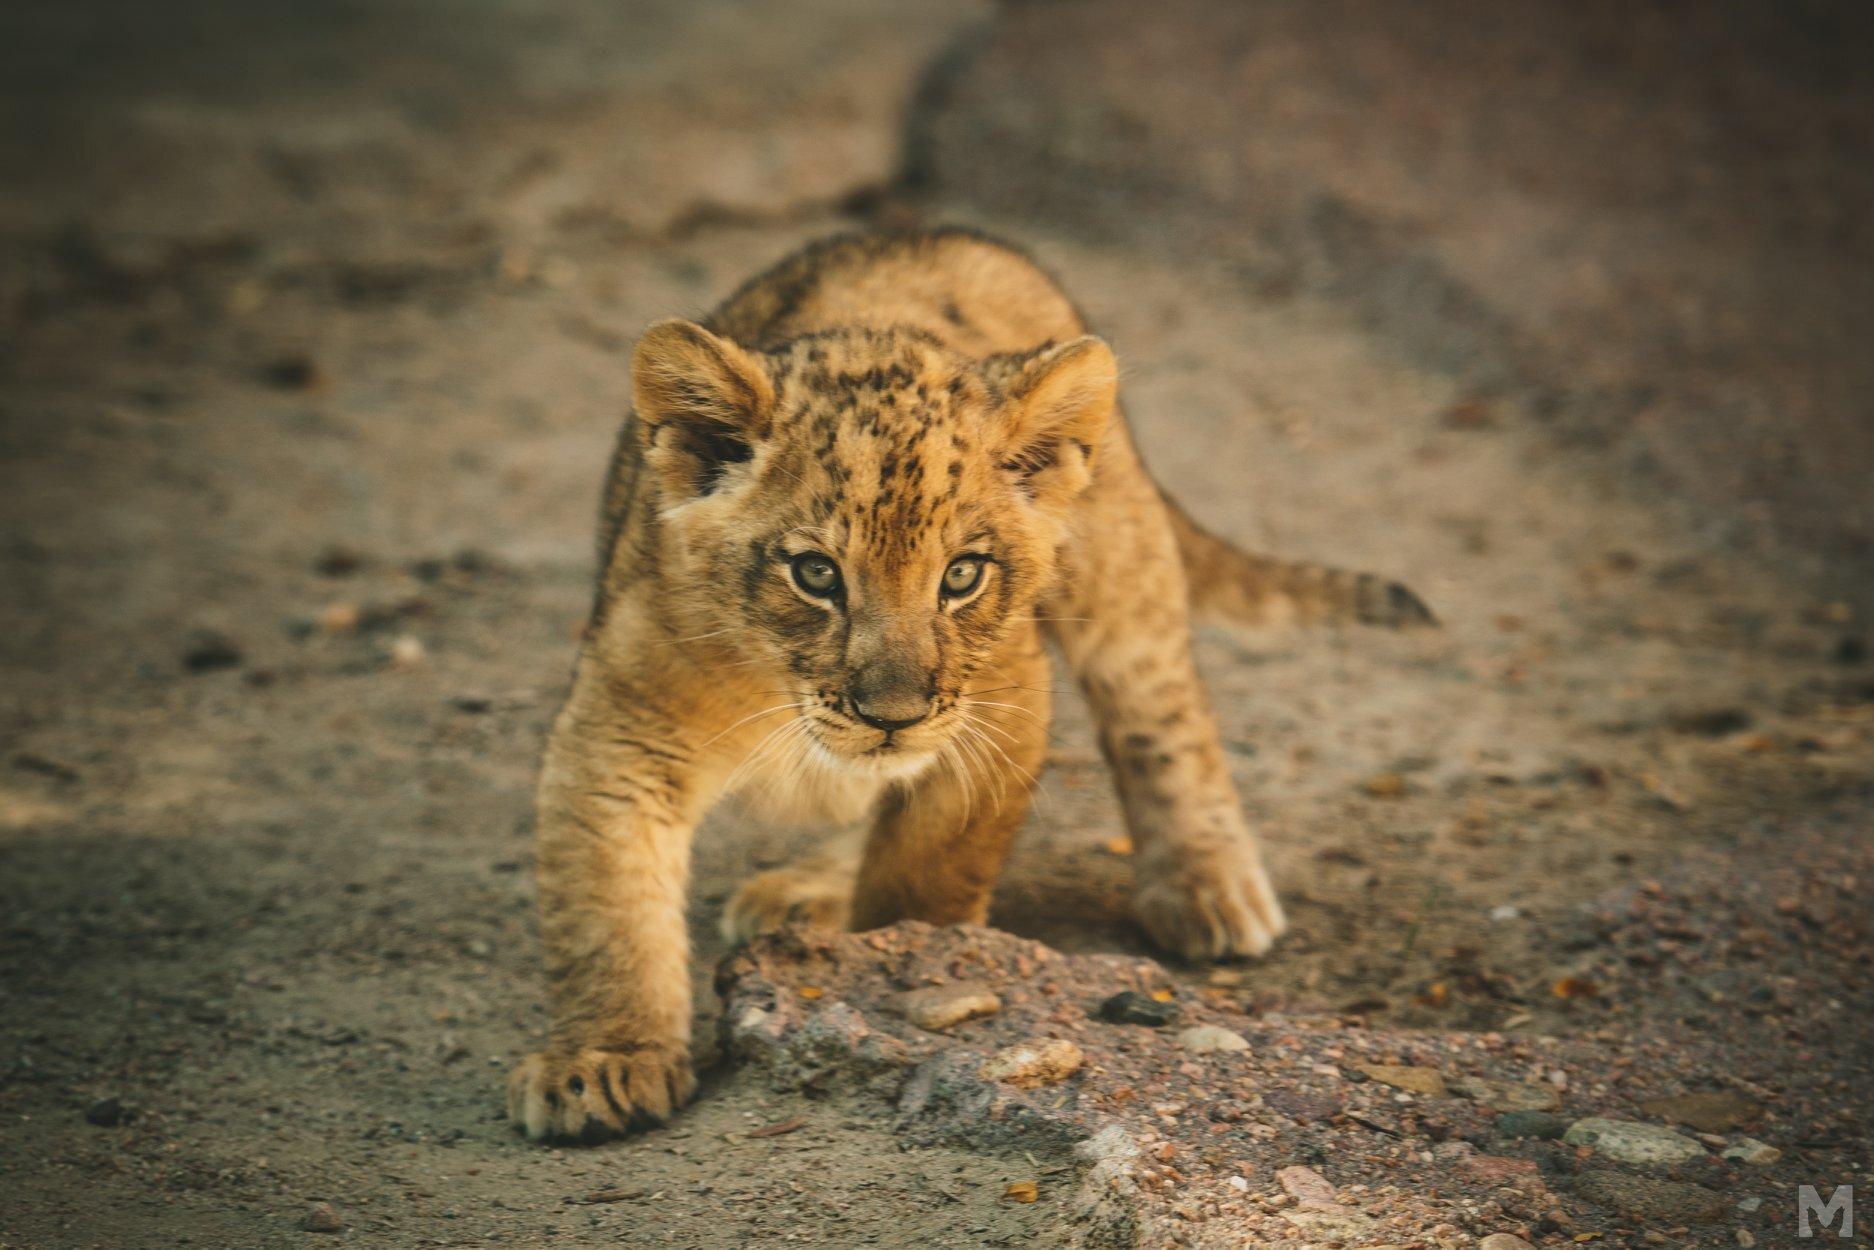 Lion Cub_8_Molly McCormick.jpg